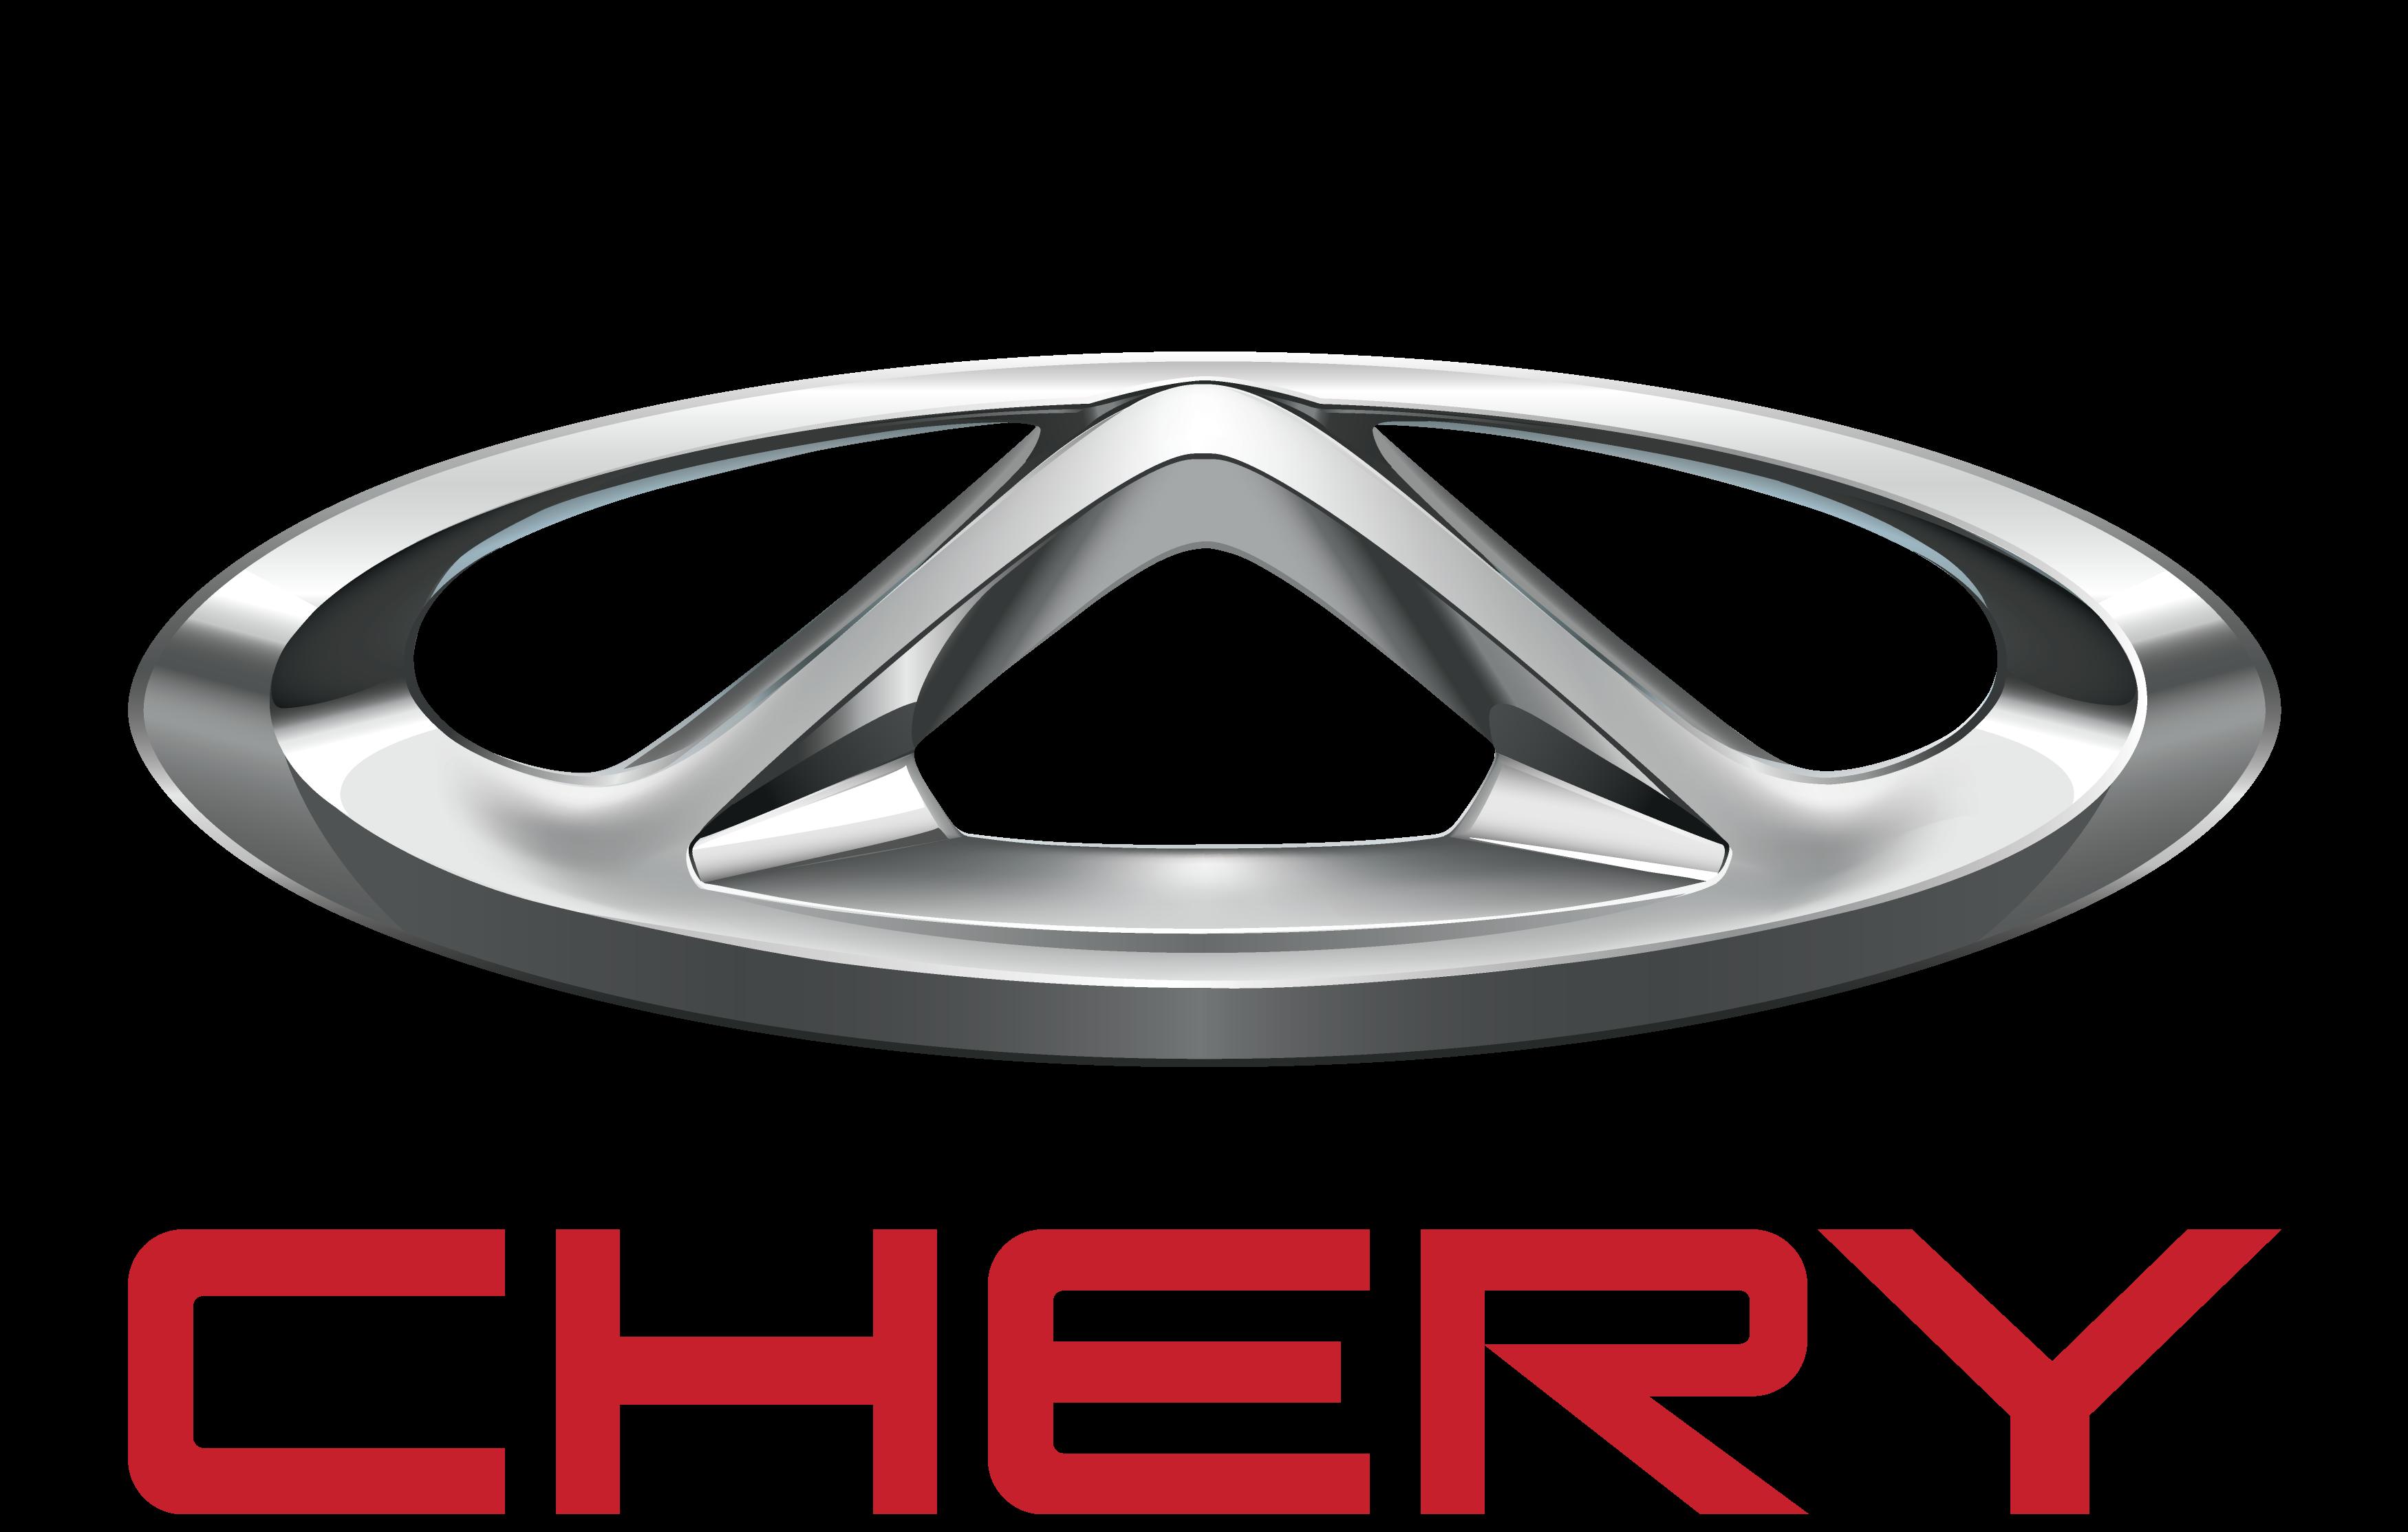 Chery logo.